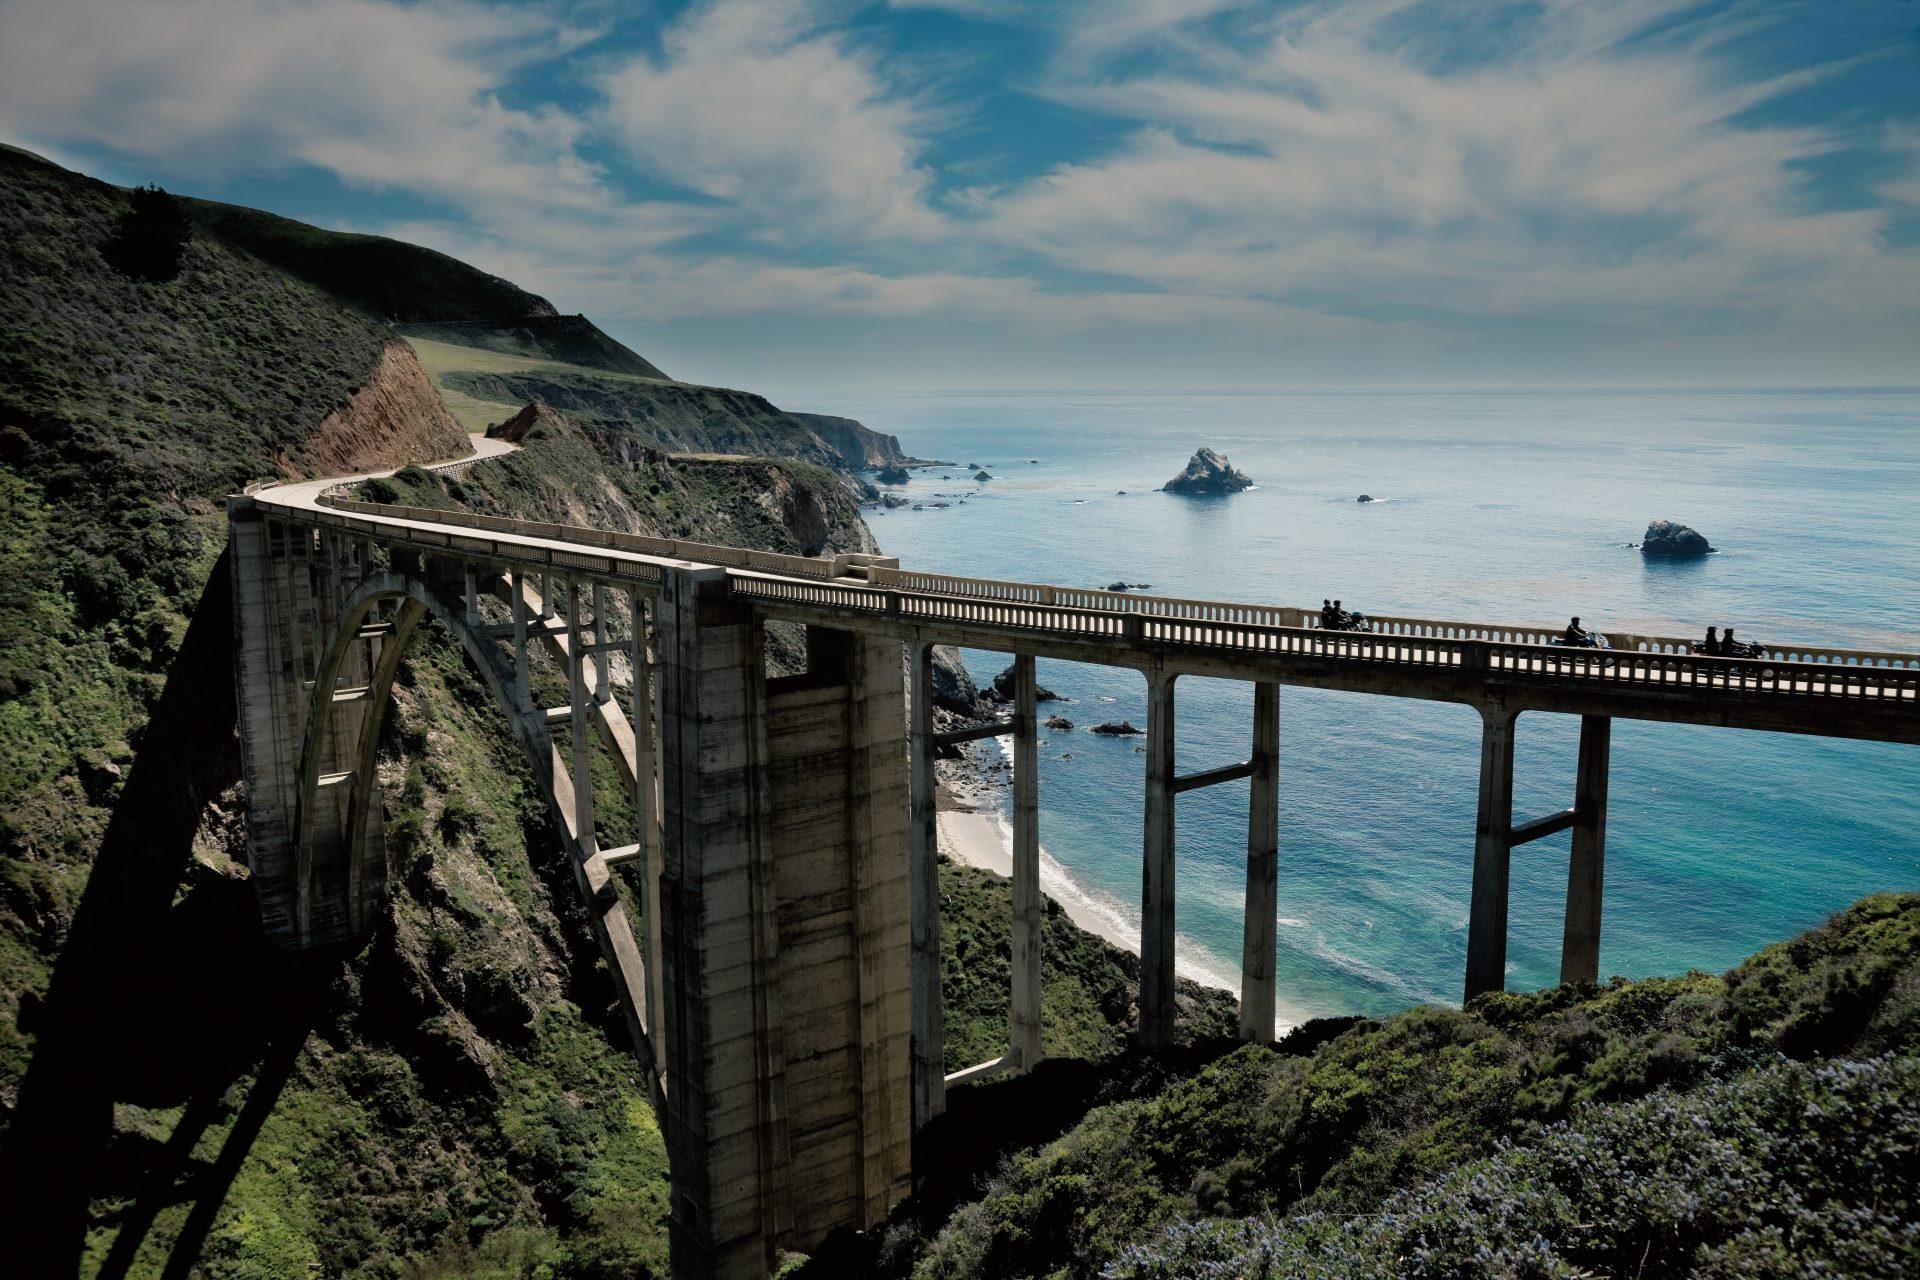 Harley Davidson Motorcycle Ride on California Highway 1